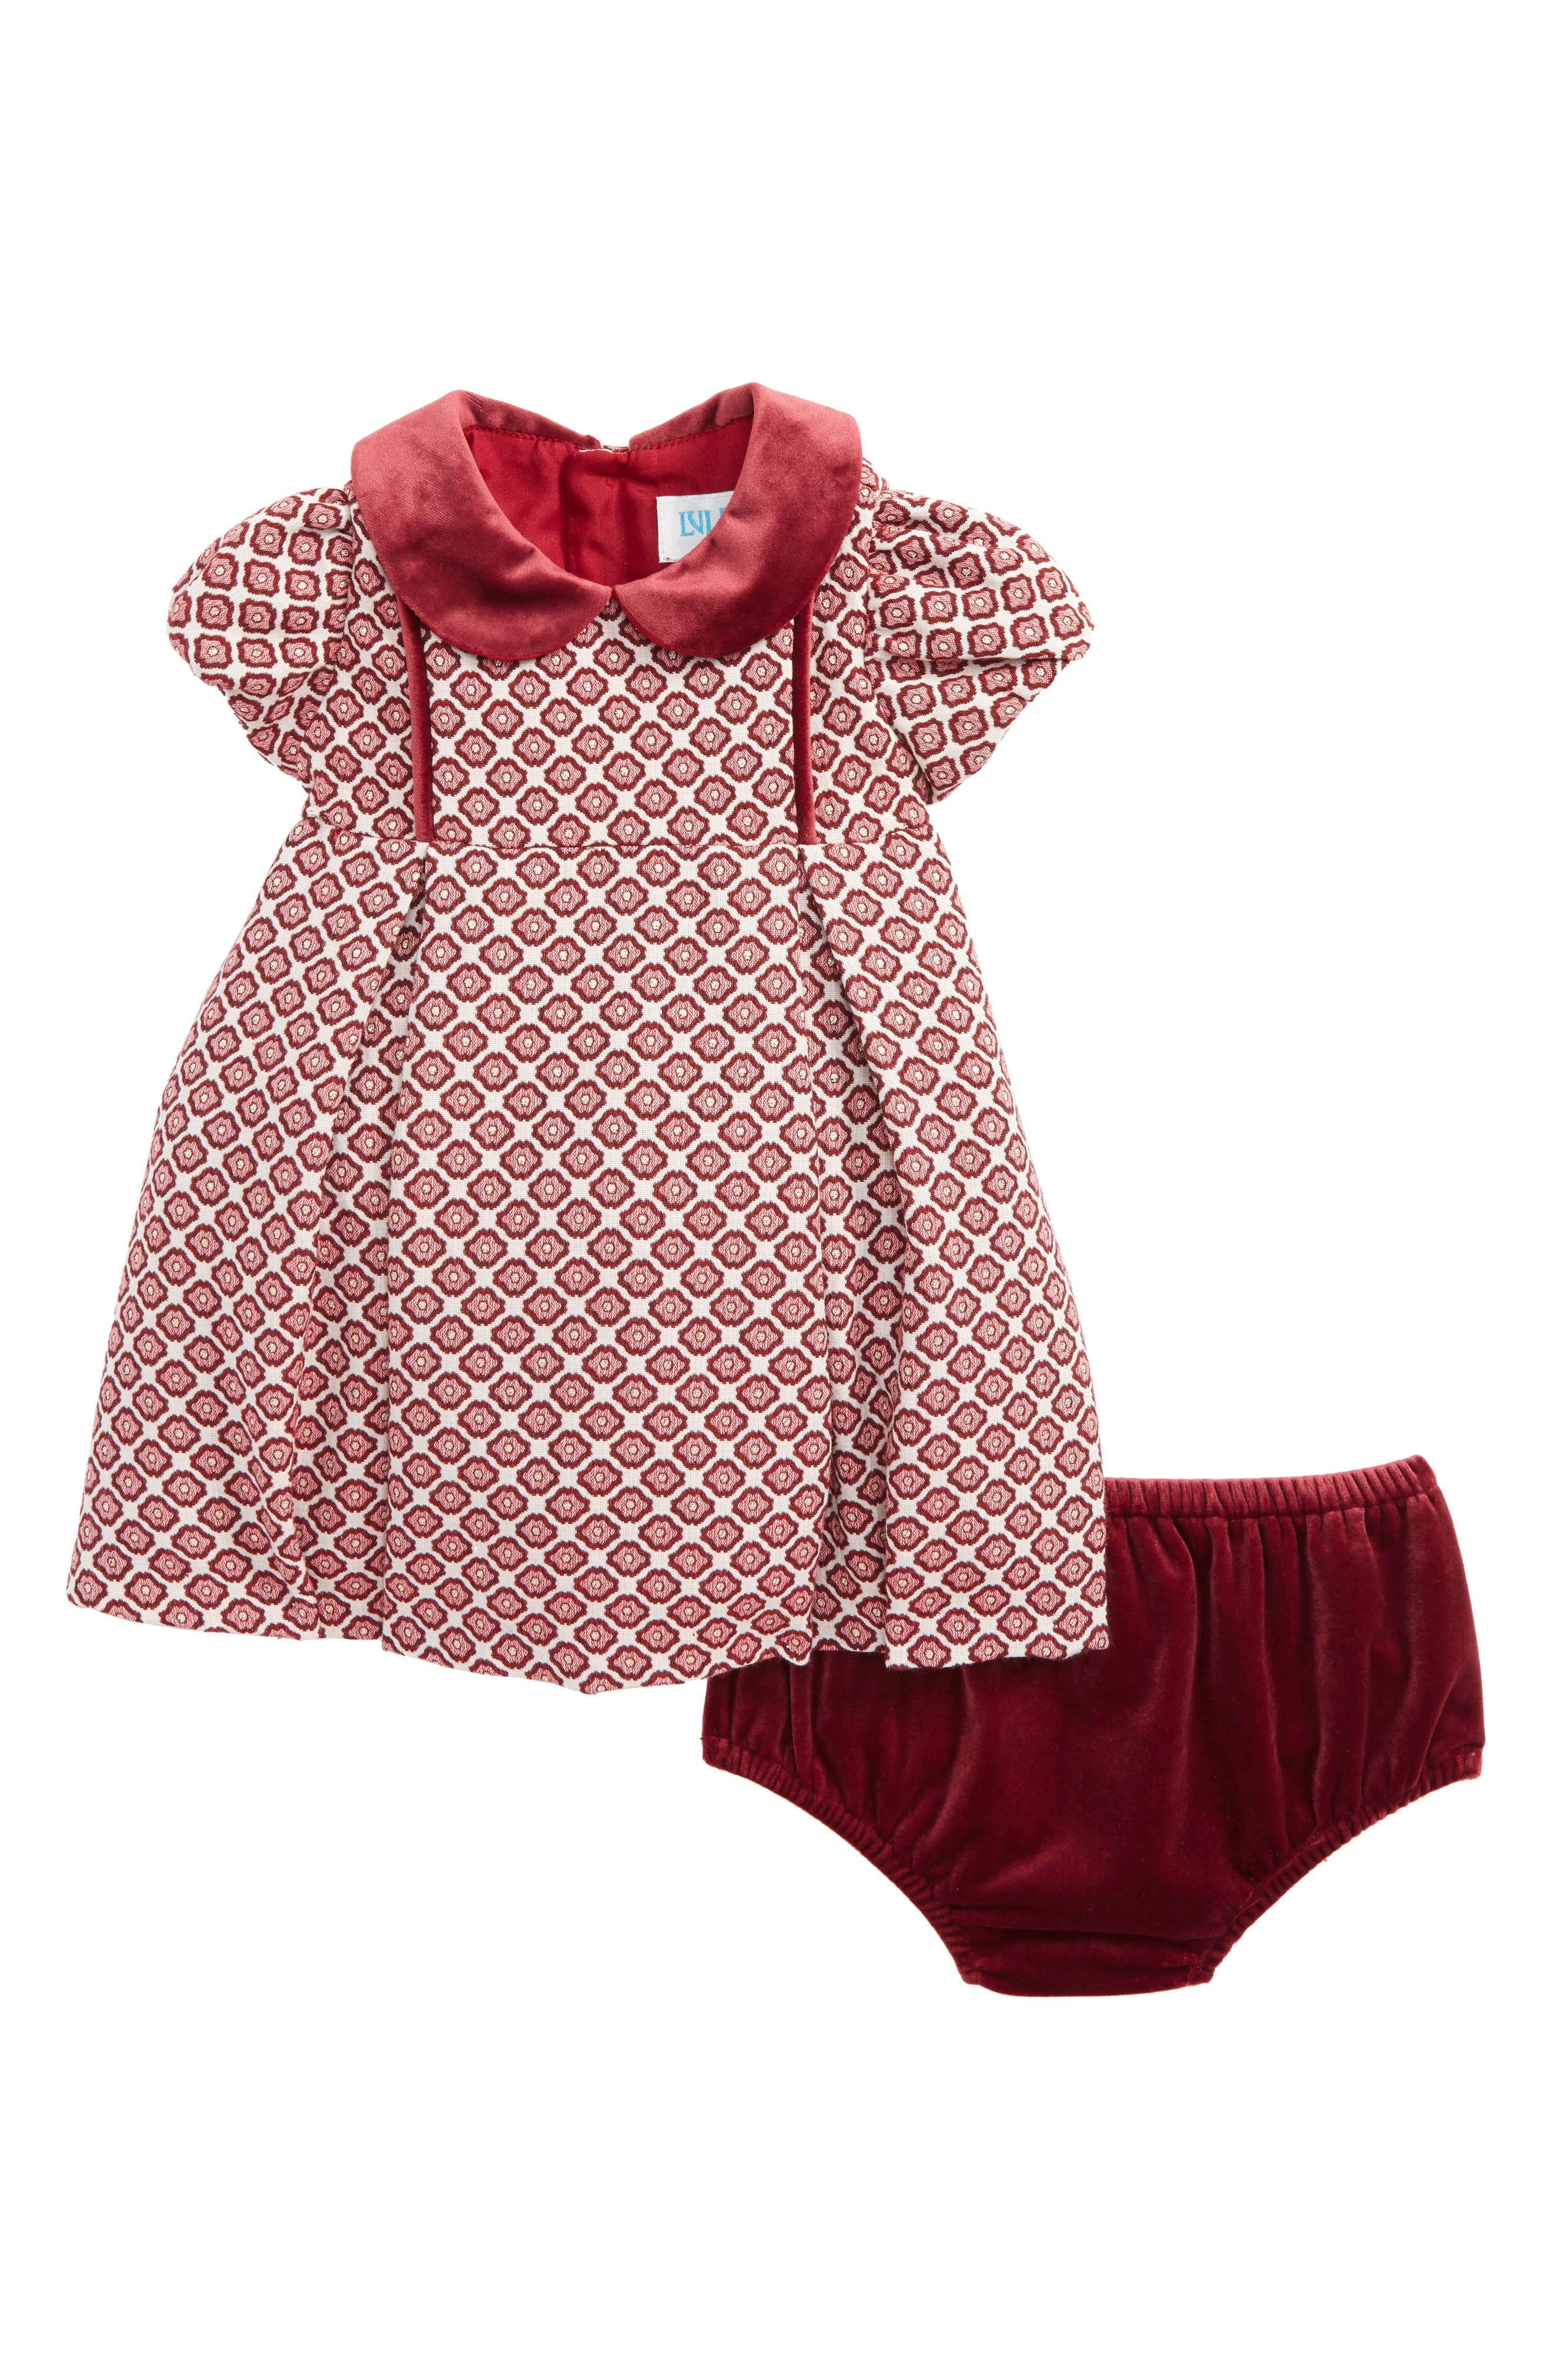 Floral Jacquard Dress,                             Main thumbnail 1, color,                             930